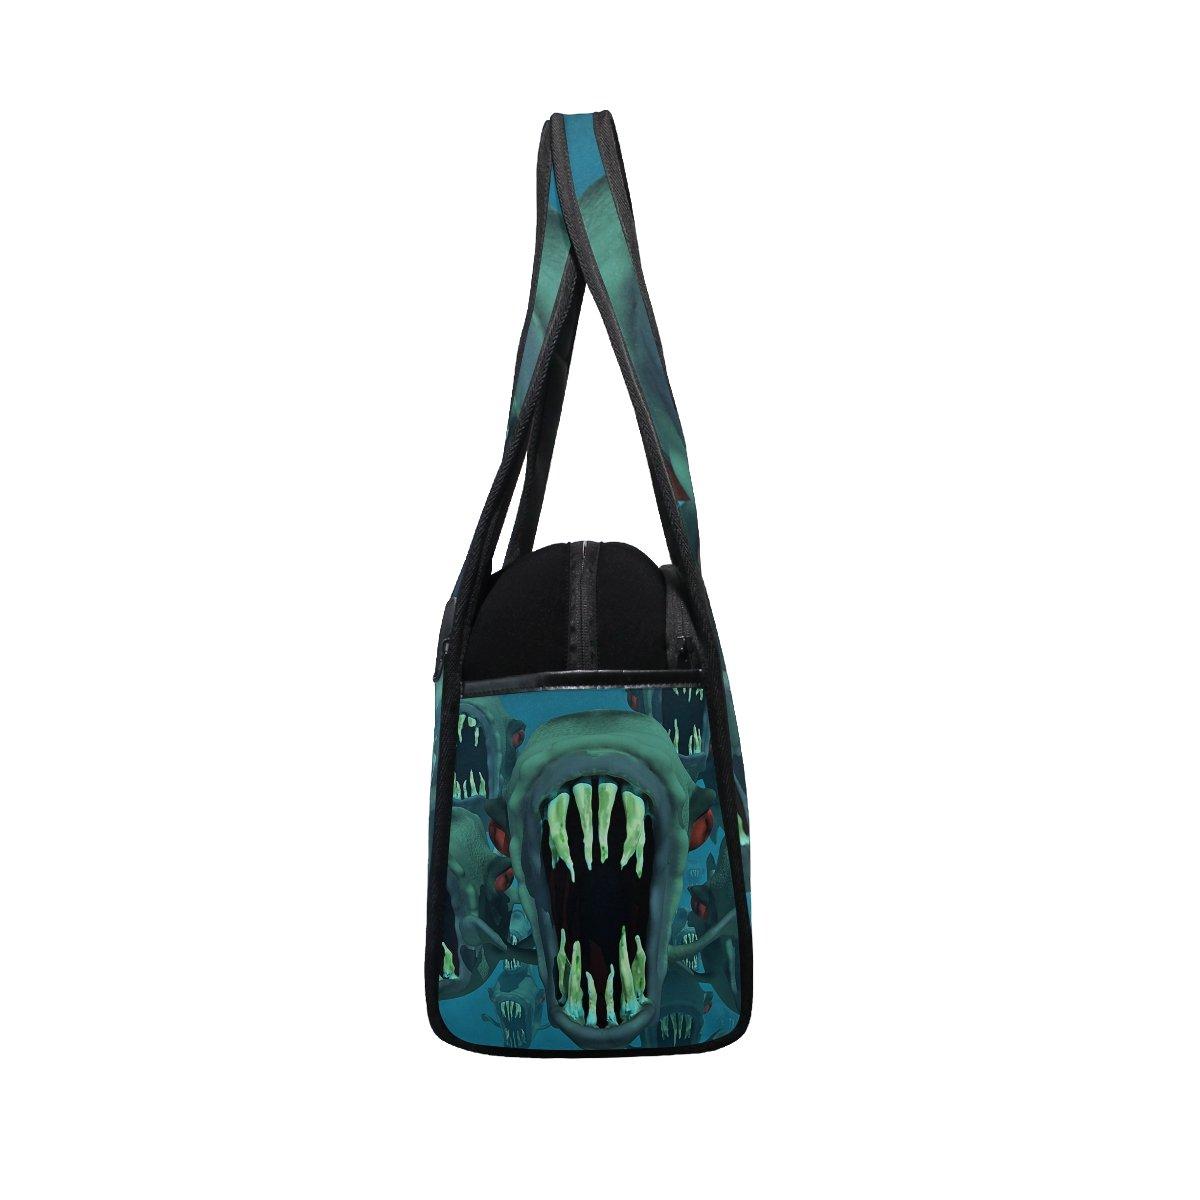 AHOMY Sports Gym Bag Piranha Terror Duffel Bag Travel Shoulder Bag